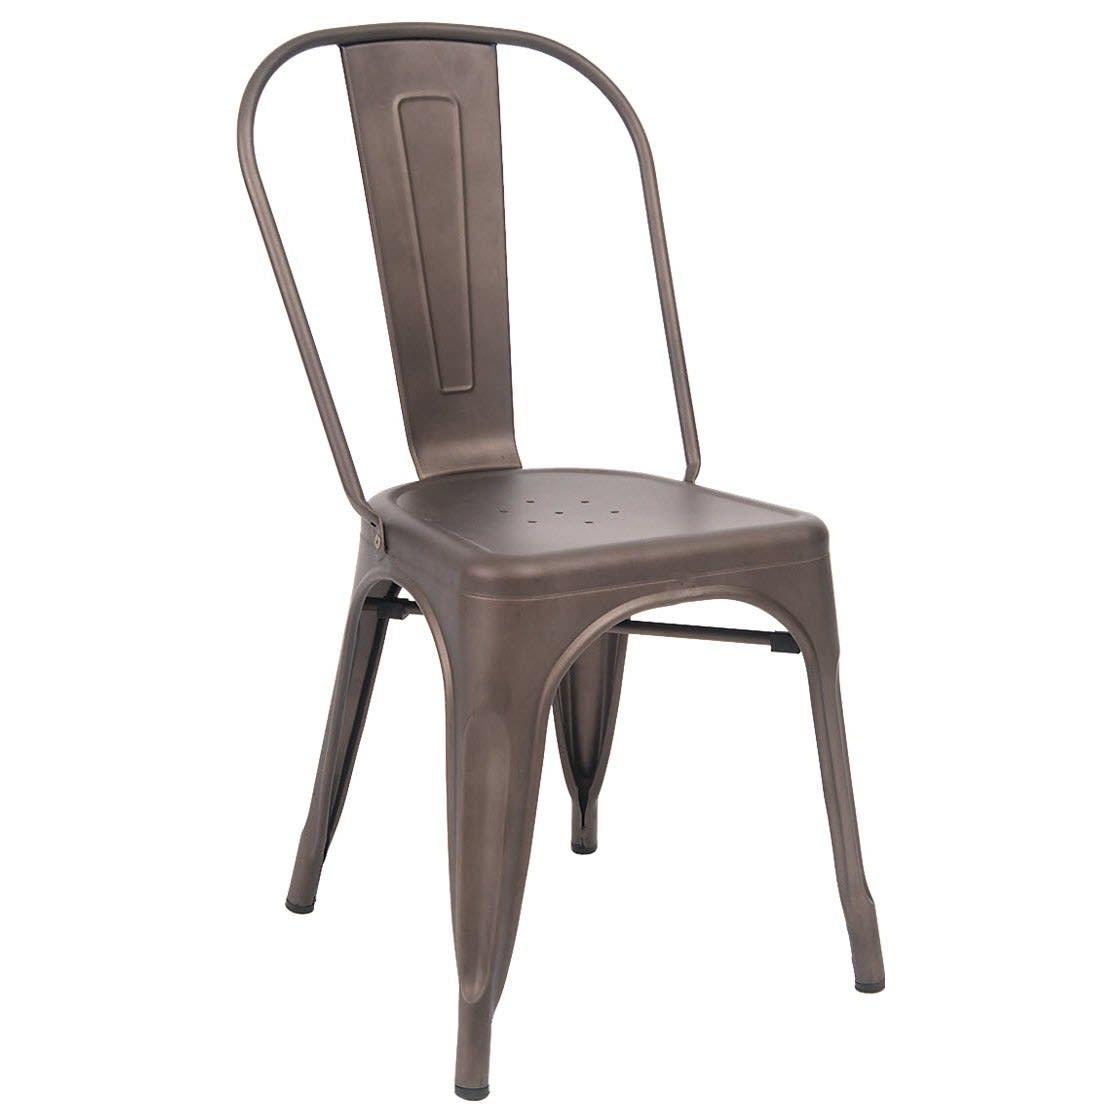 Bistro Style Metal Chair in Dark Grey Finish